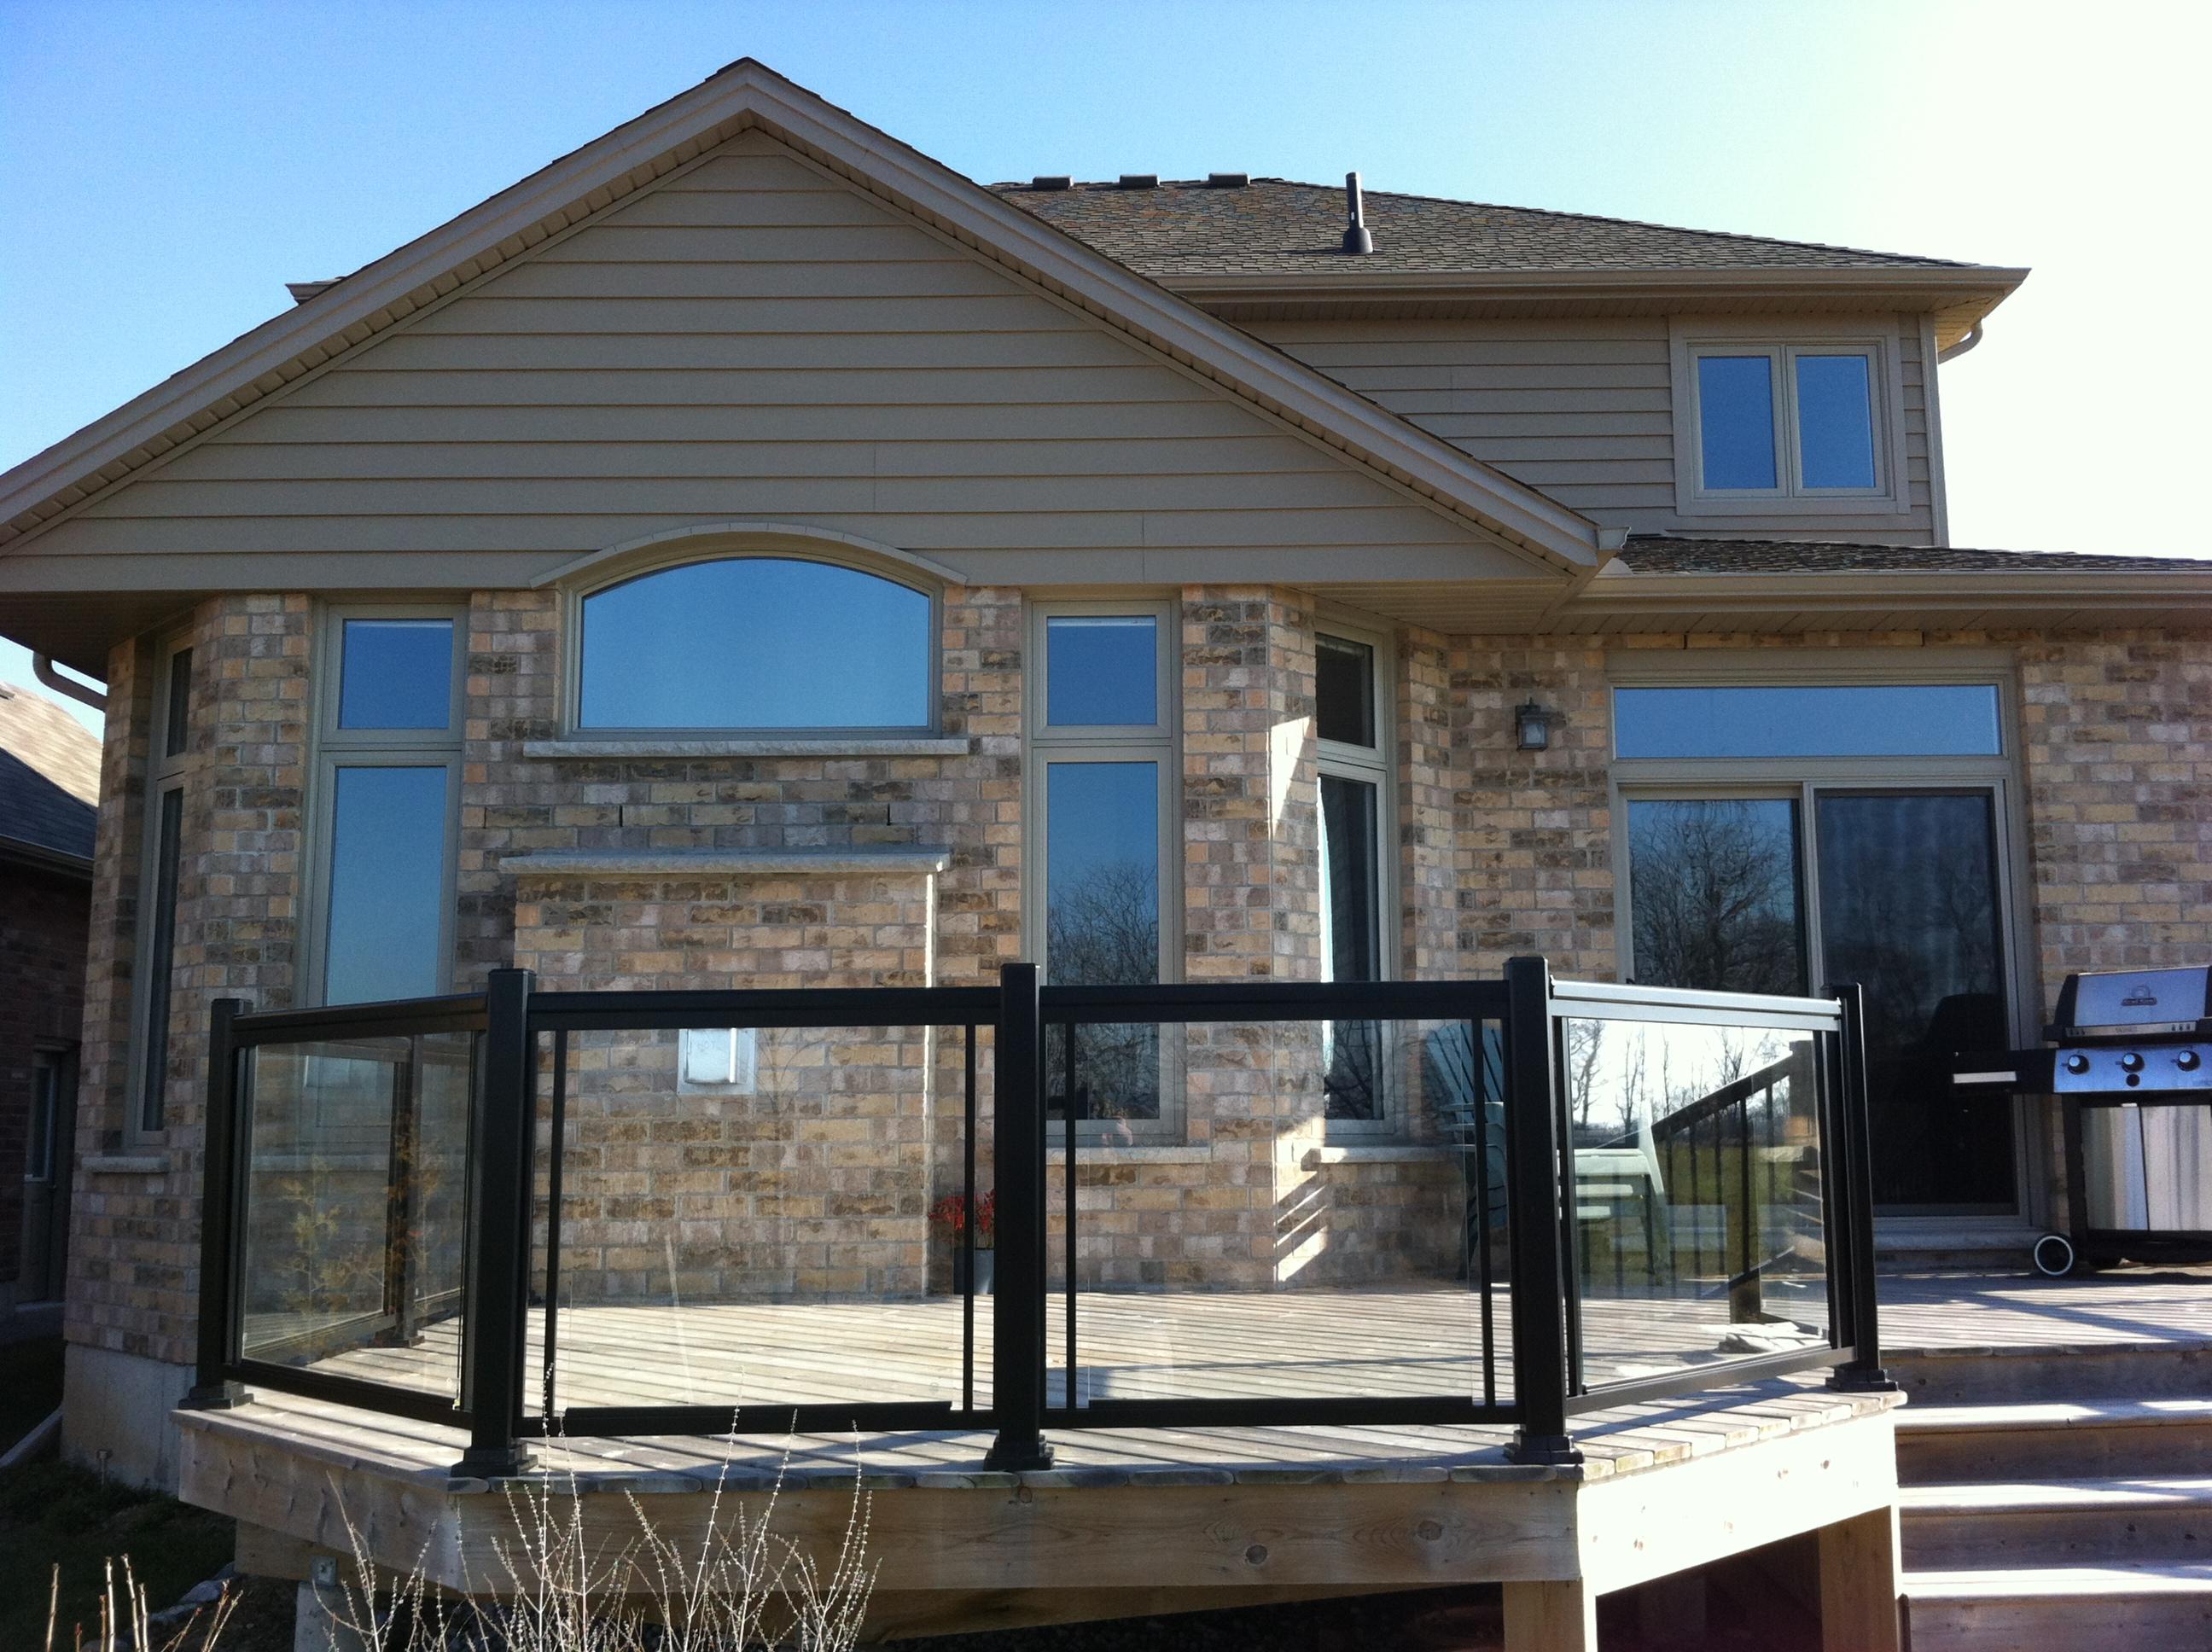 New North Star Windows, North Star Patio Doors and Prodigy Siding